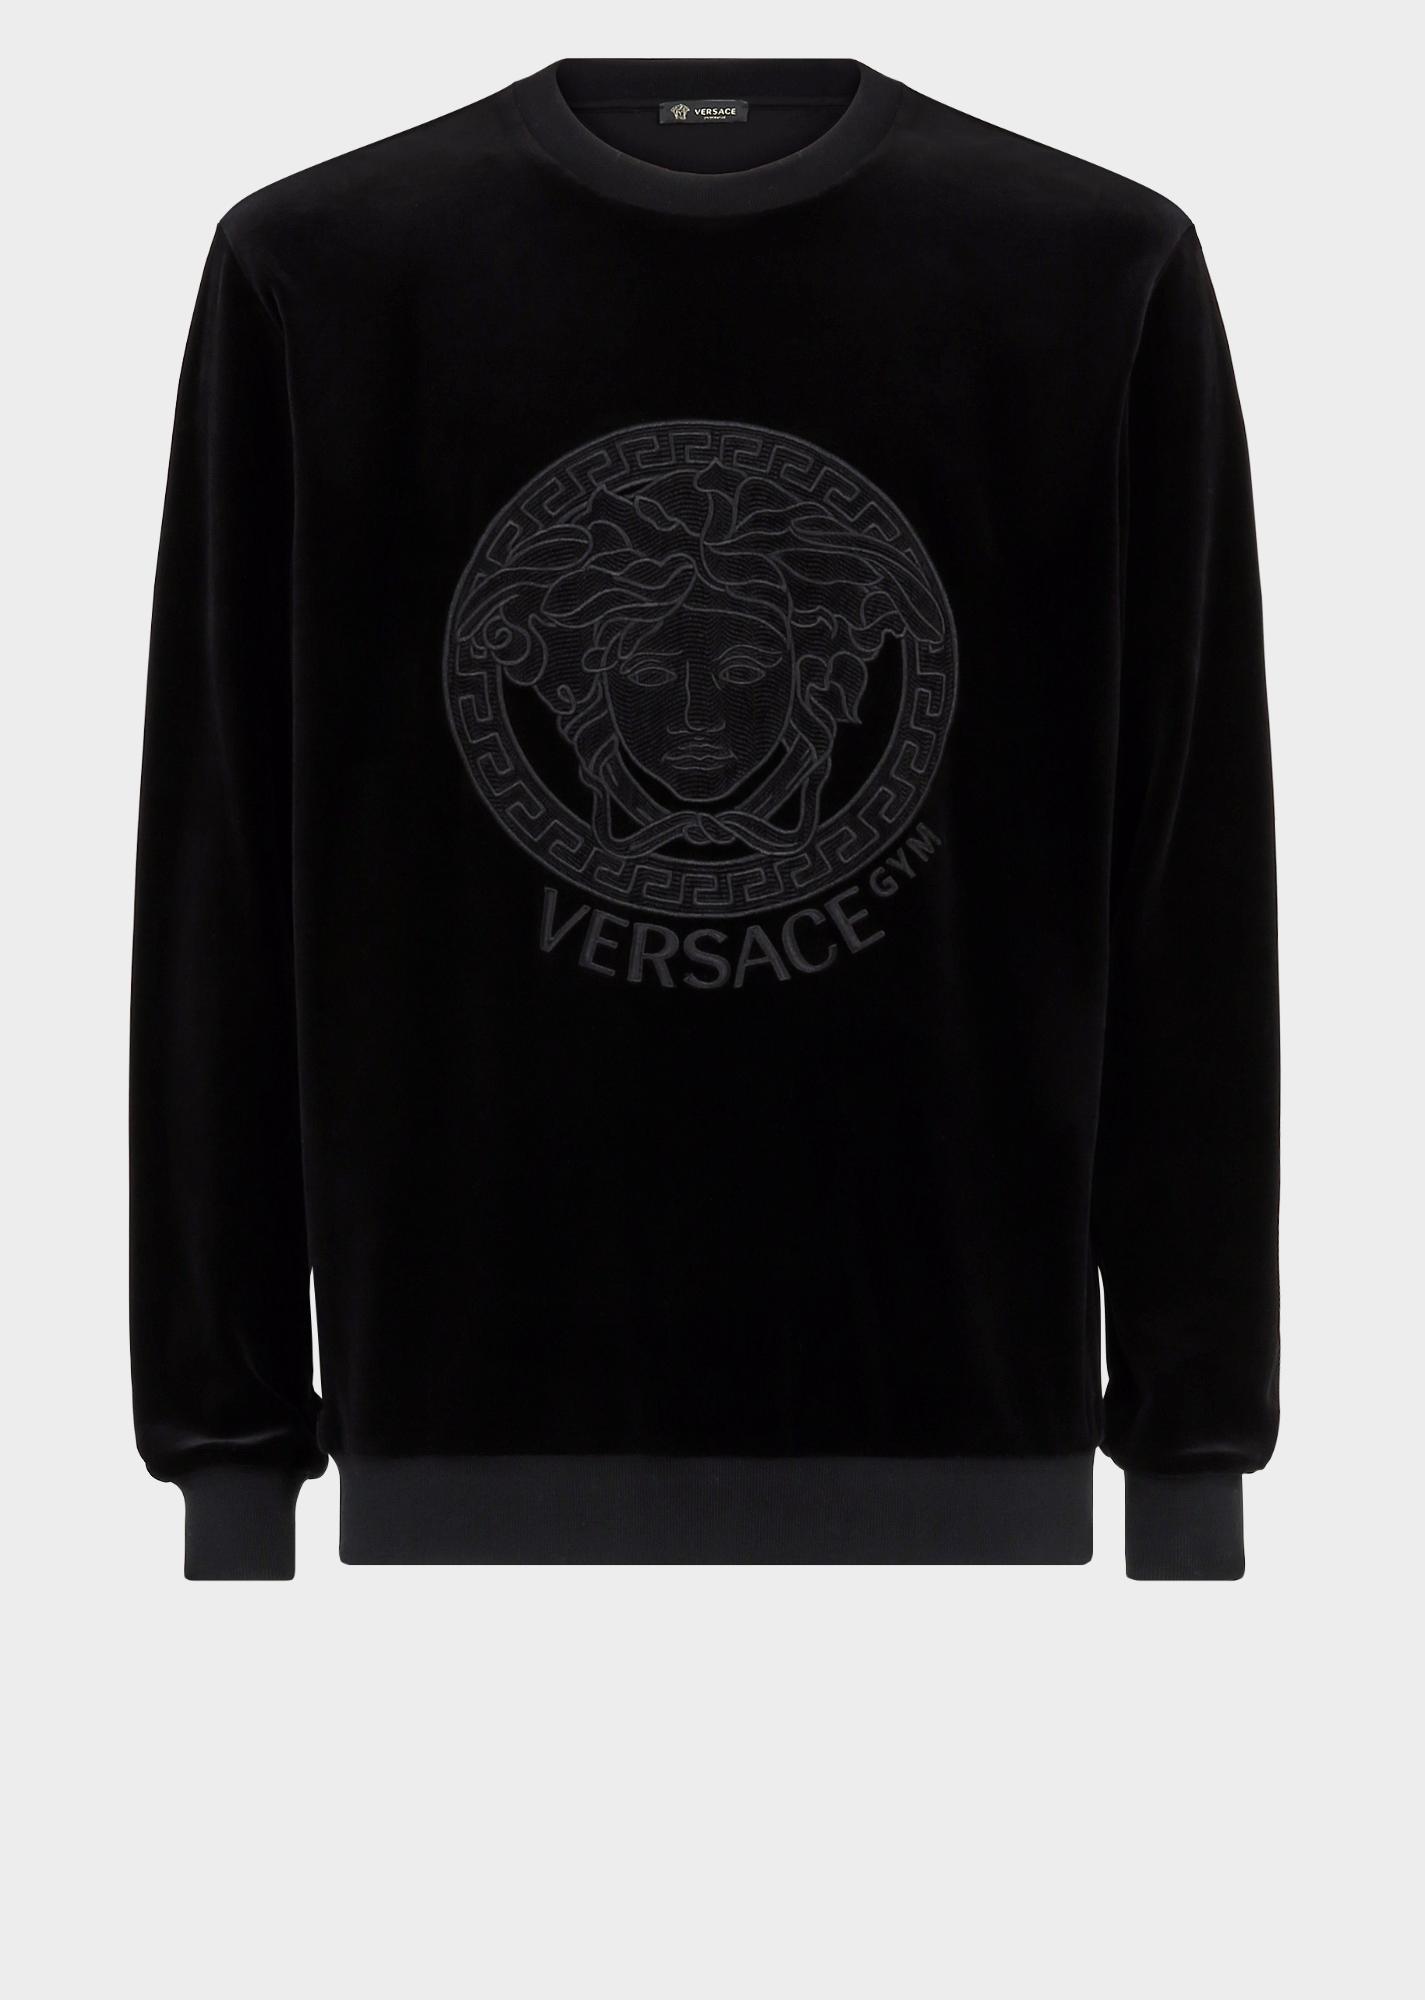 20bf2a50 VERSACE Velvet Medusa Sweatshirt. #versace #cloth | Versace ...